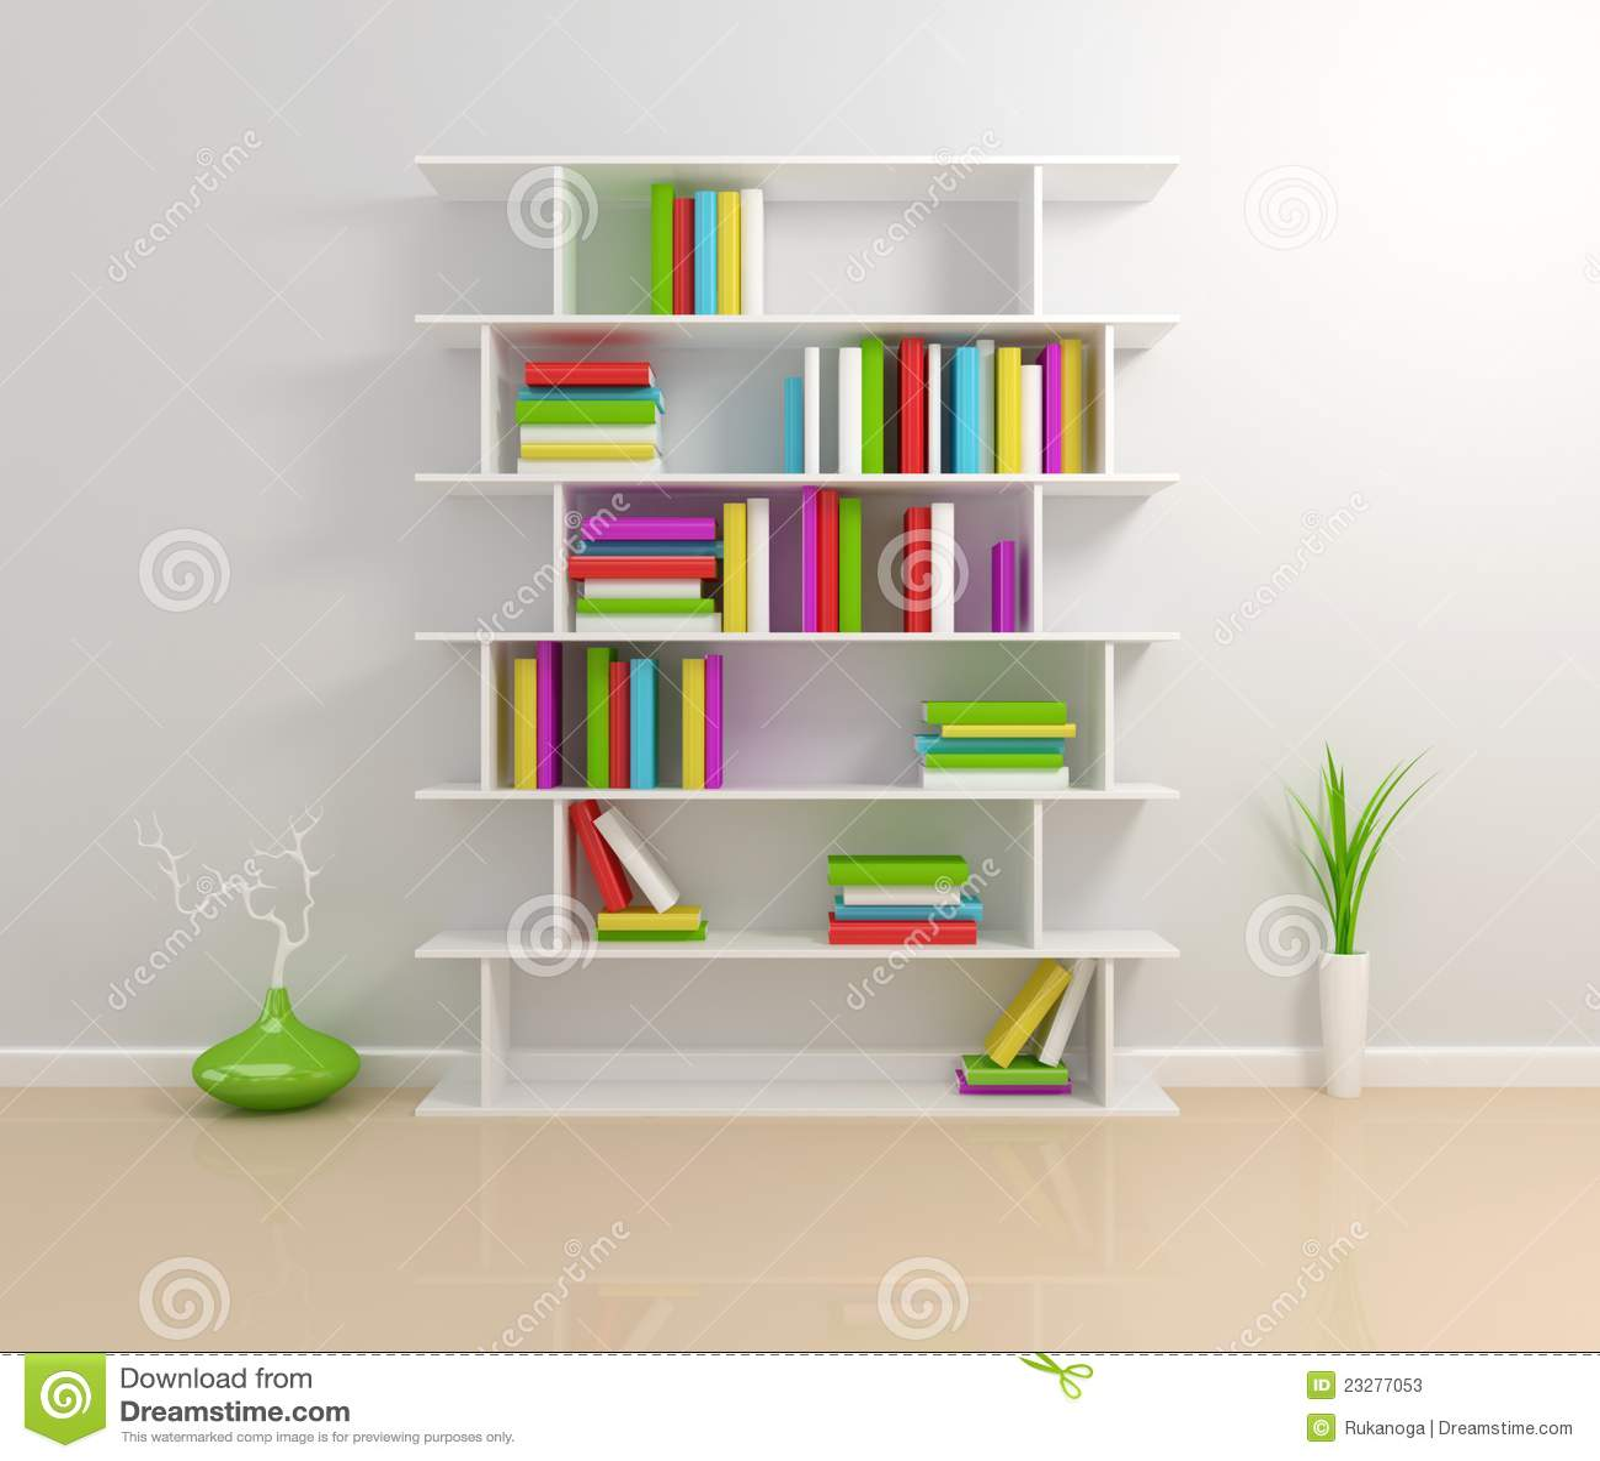 tag re blanche avec livres color s photos stock image 23277053. Black Bedroom Furniture Sets. Home Design Ideas